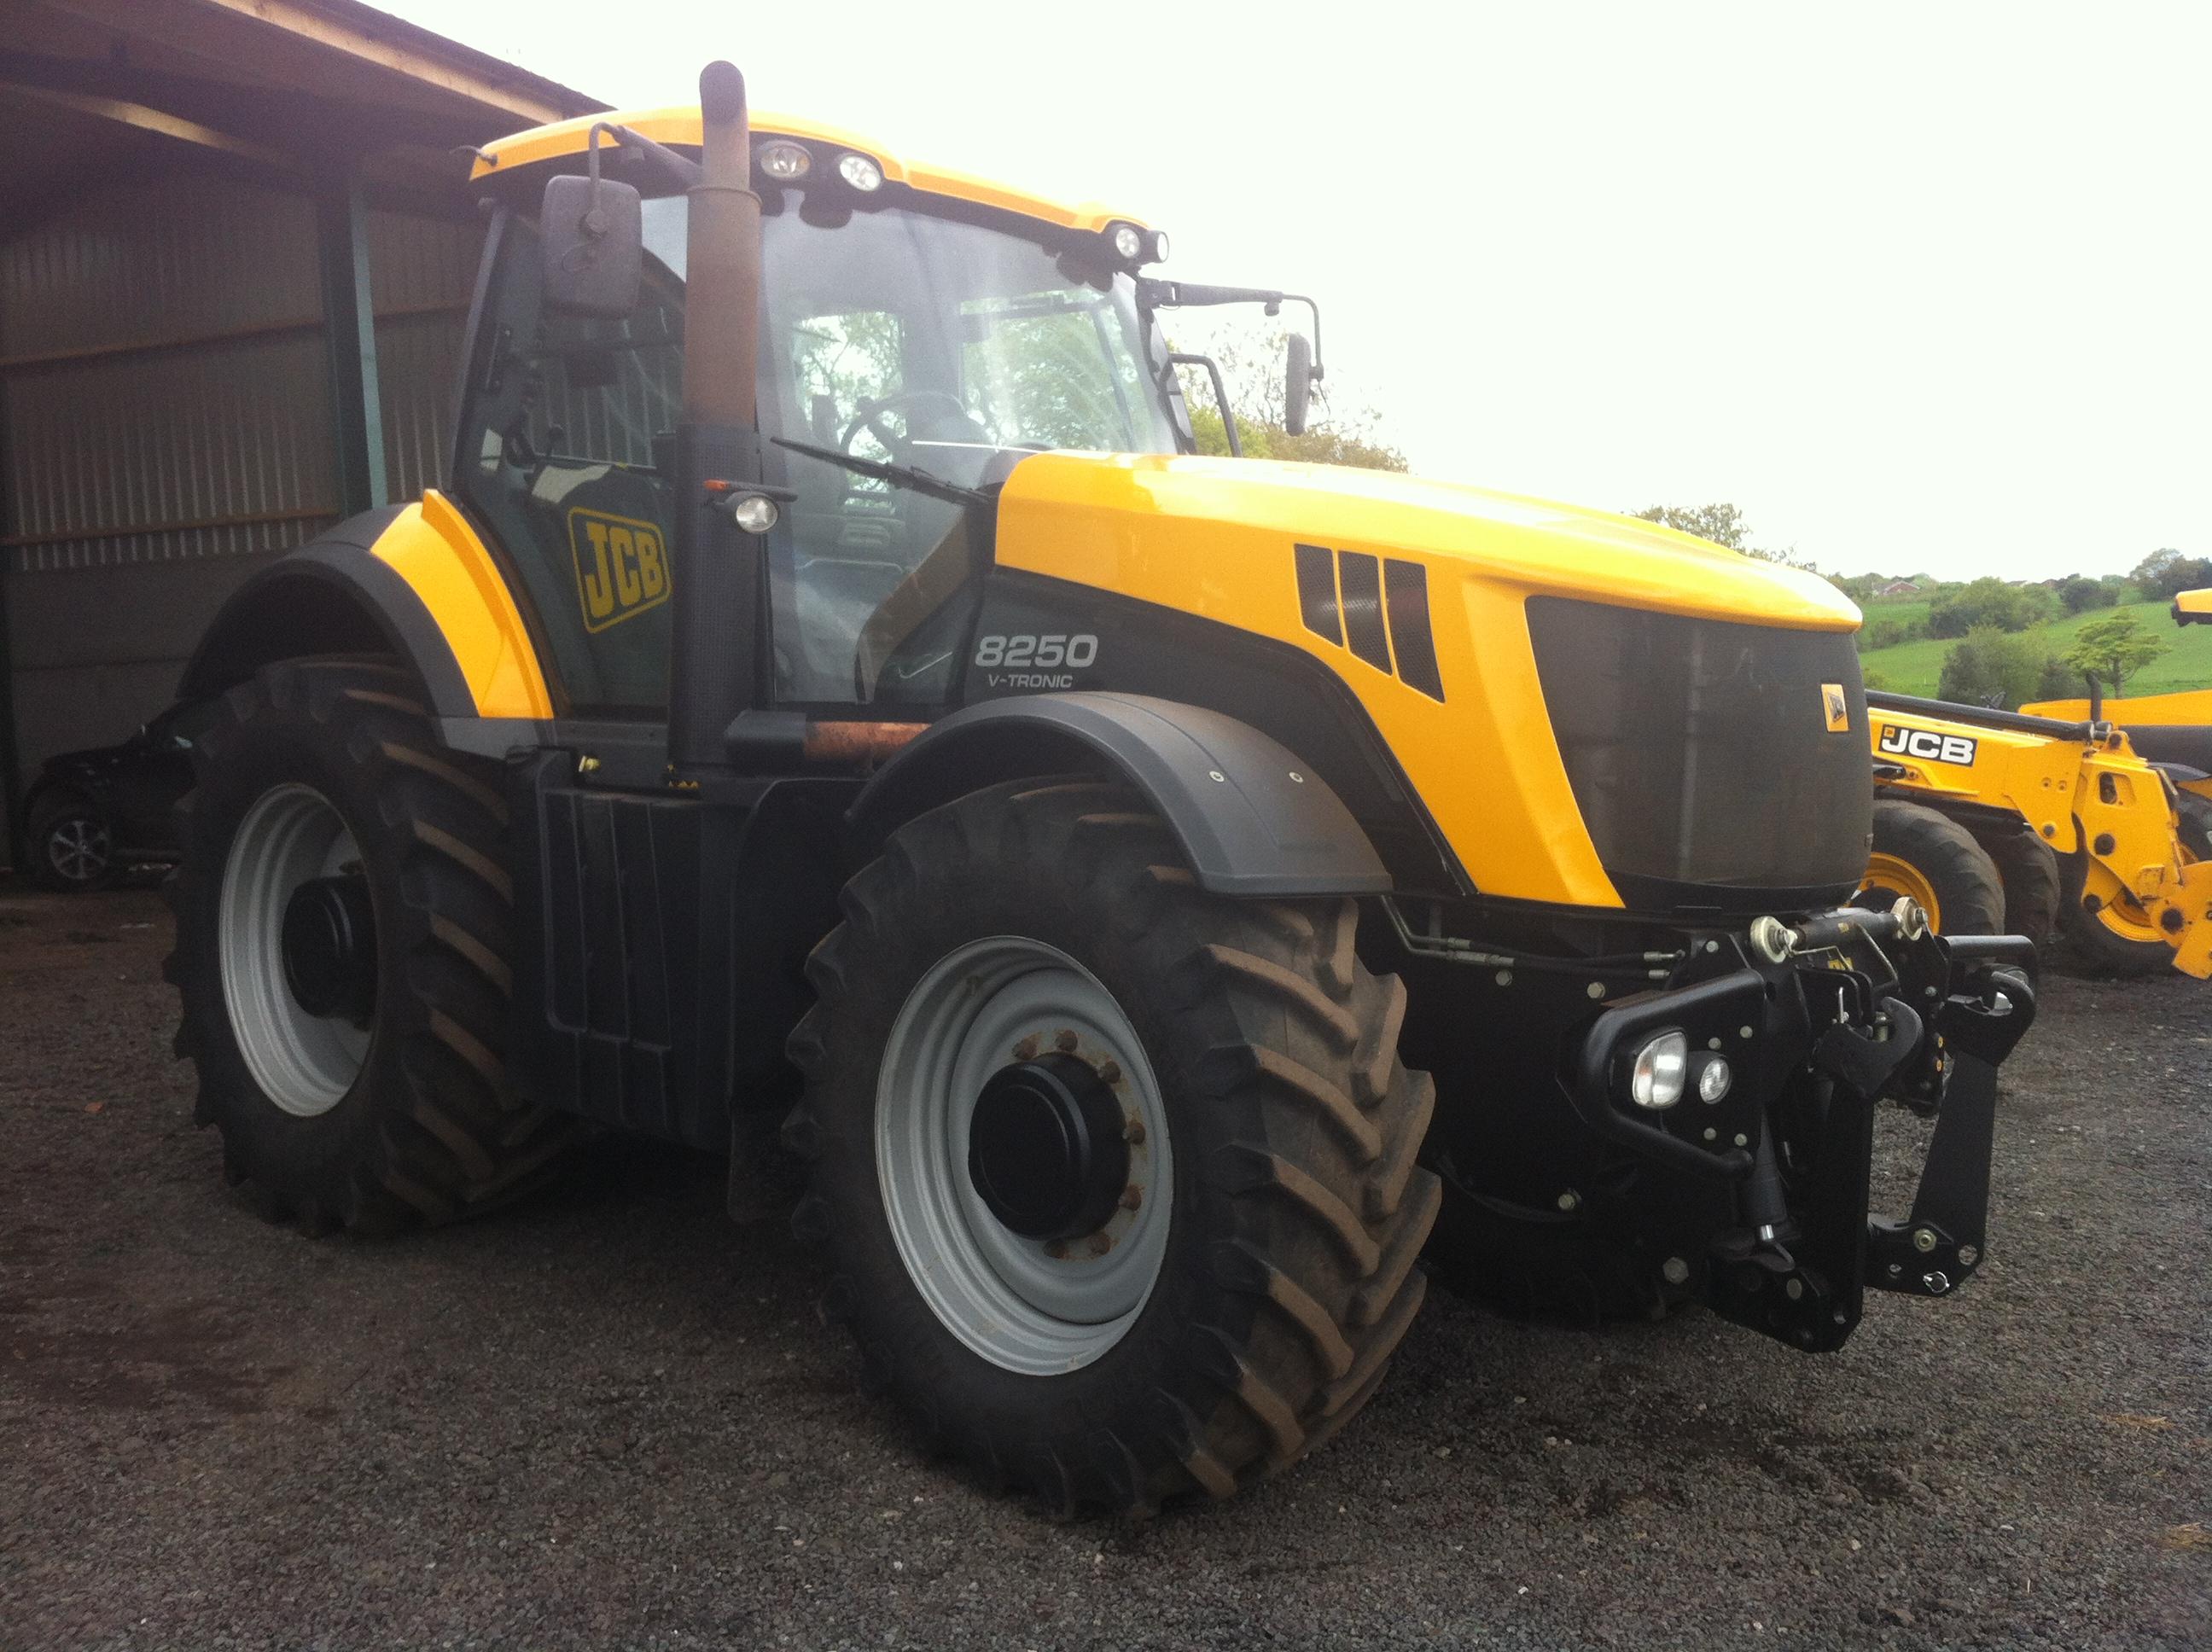 jcb fastrac 8250 used jcb for sale dewhurst agri ...